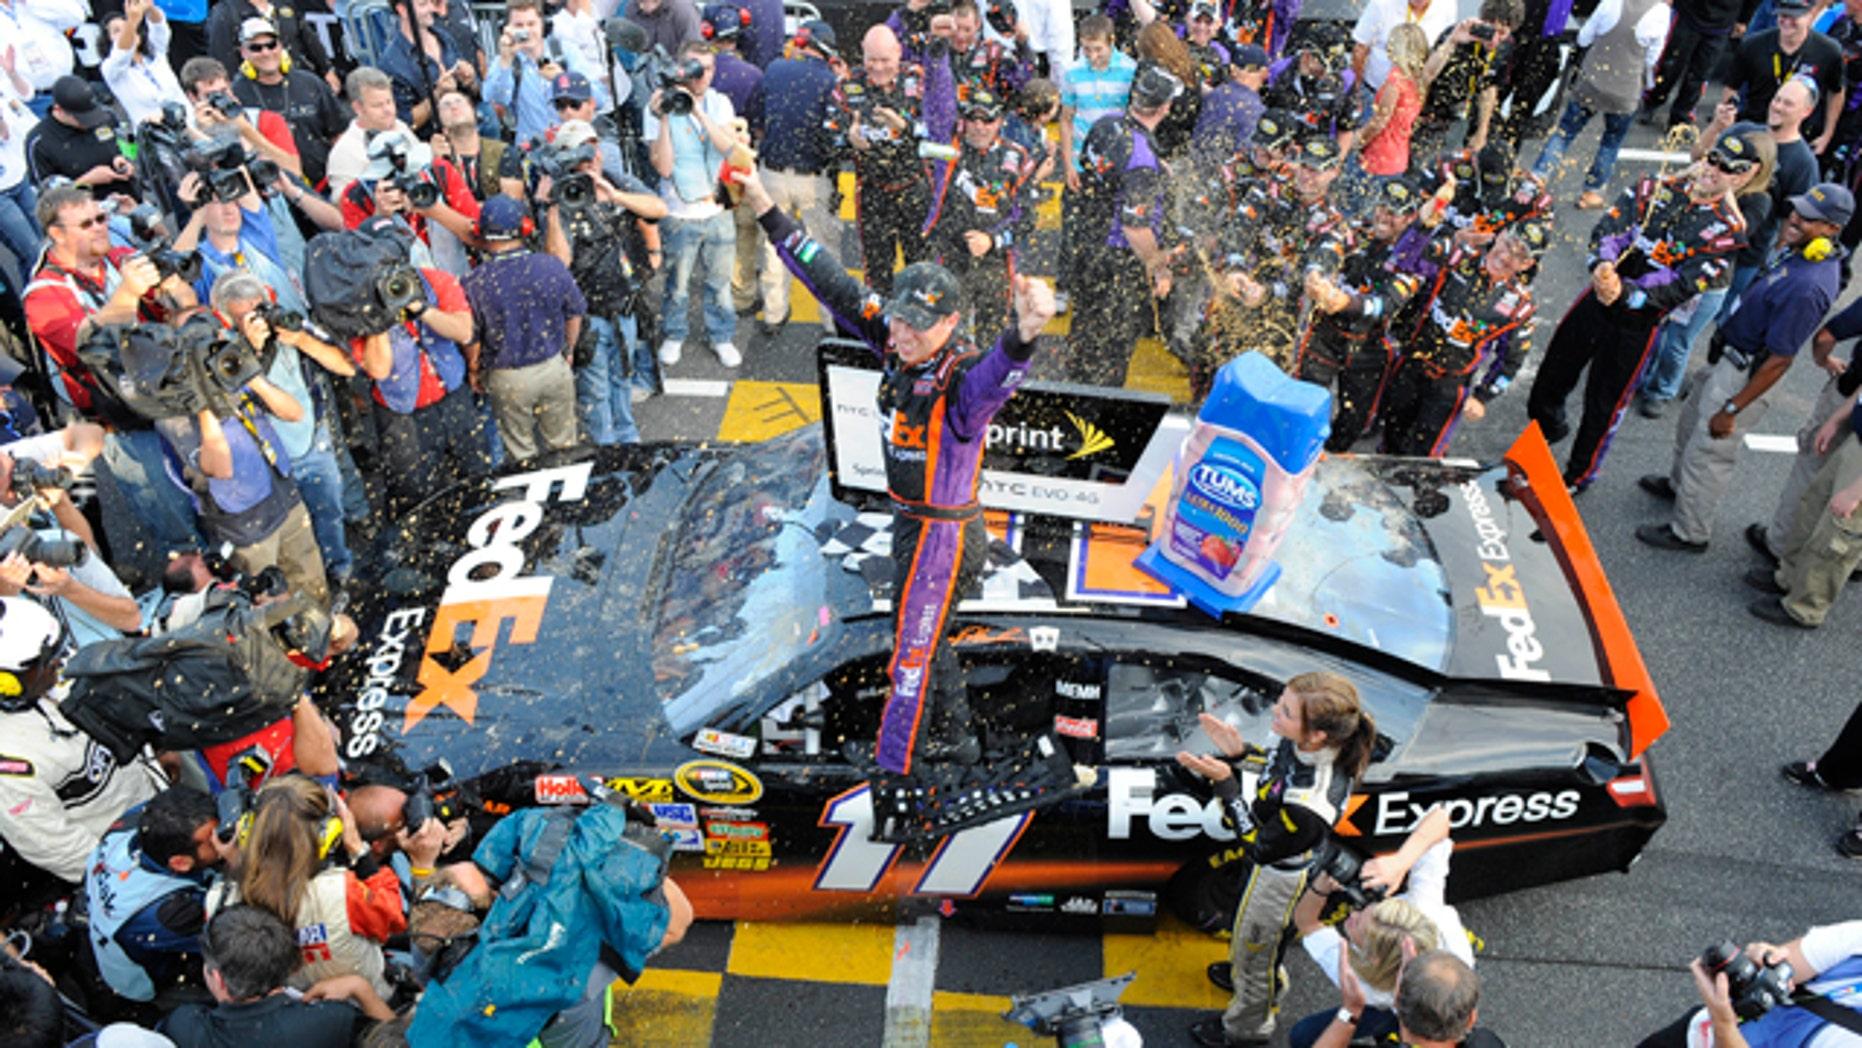 Oct. 24: Denny Hamlin celebrates after winning the NASCAR Sprint Cup Series auto race at Martinsville Speedway in Martinsville, Va.